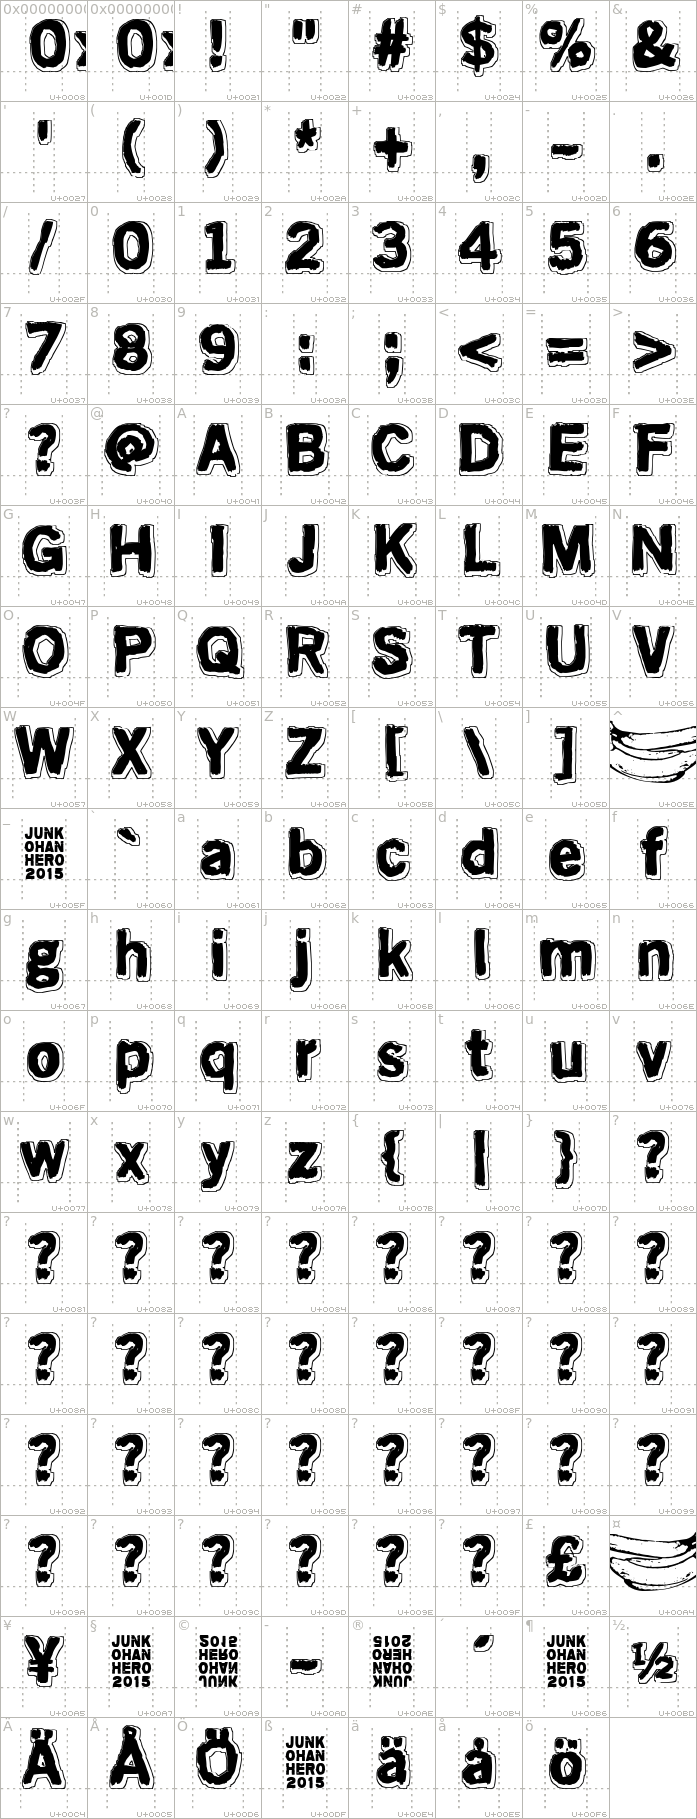 mongo-bondo.regular.character-map-1